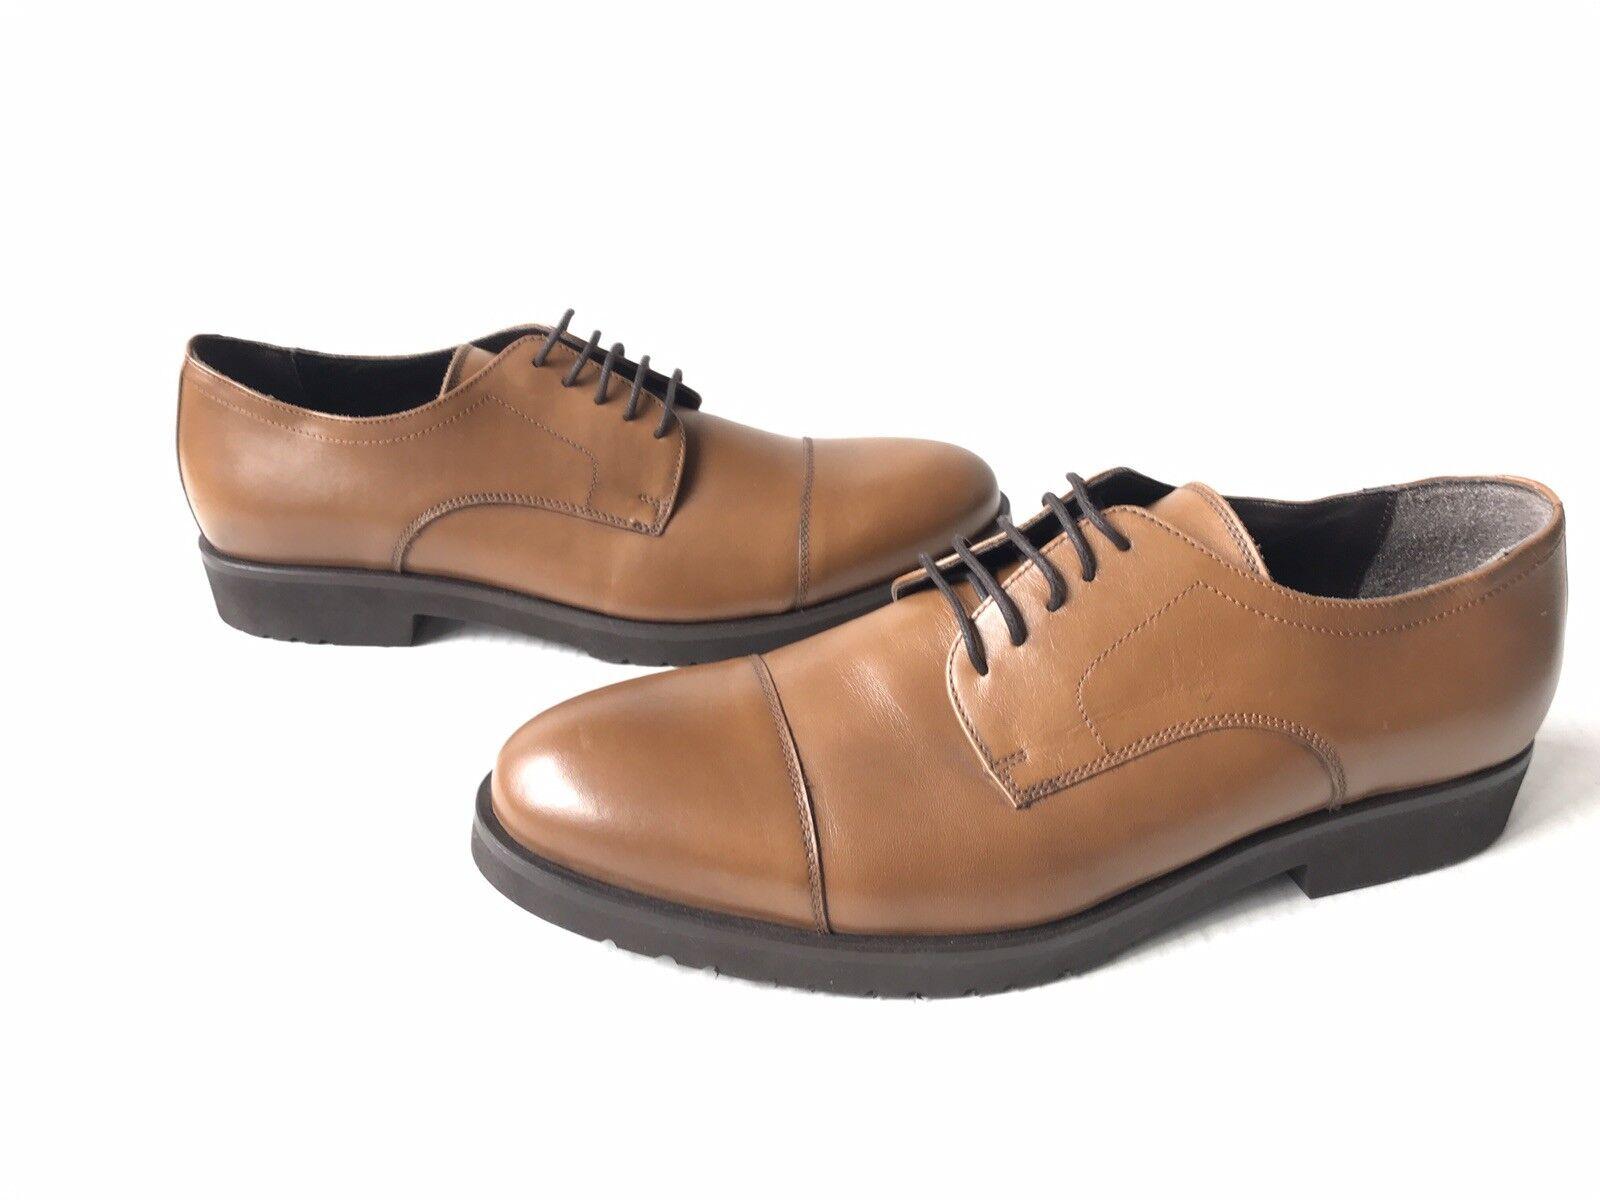 A.Testoni Cap Toe Derby. Size 10.